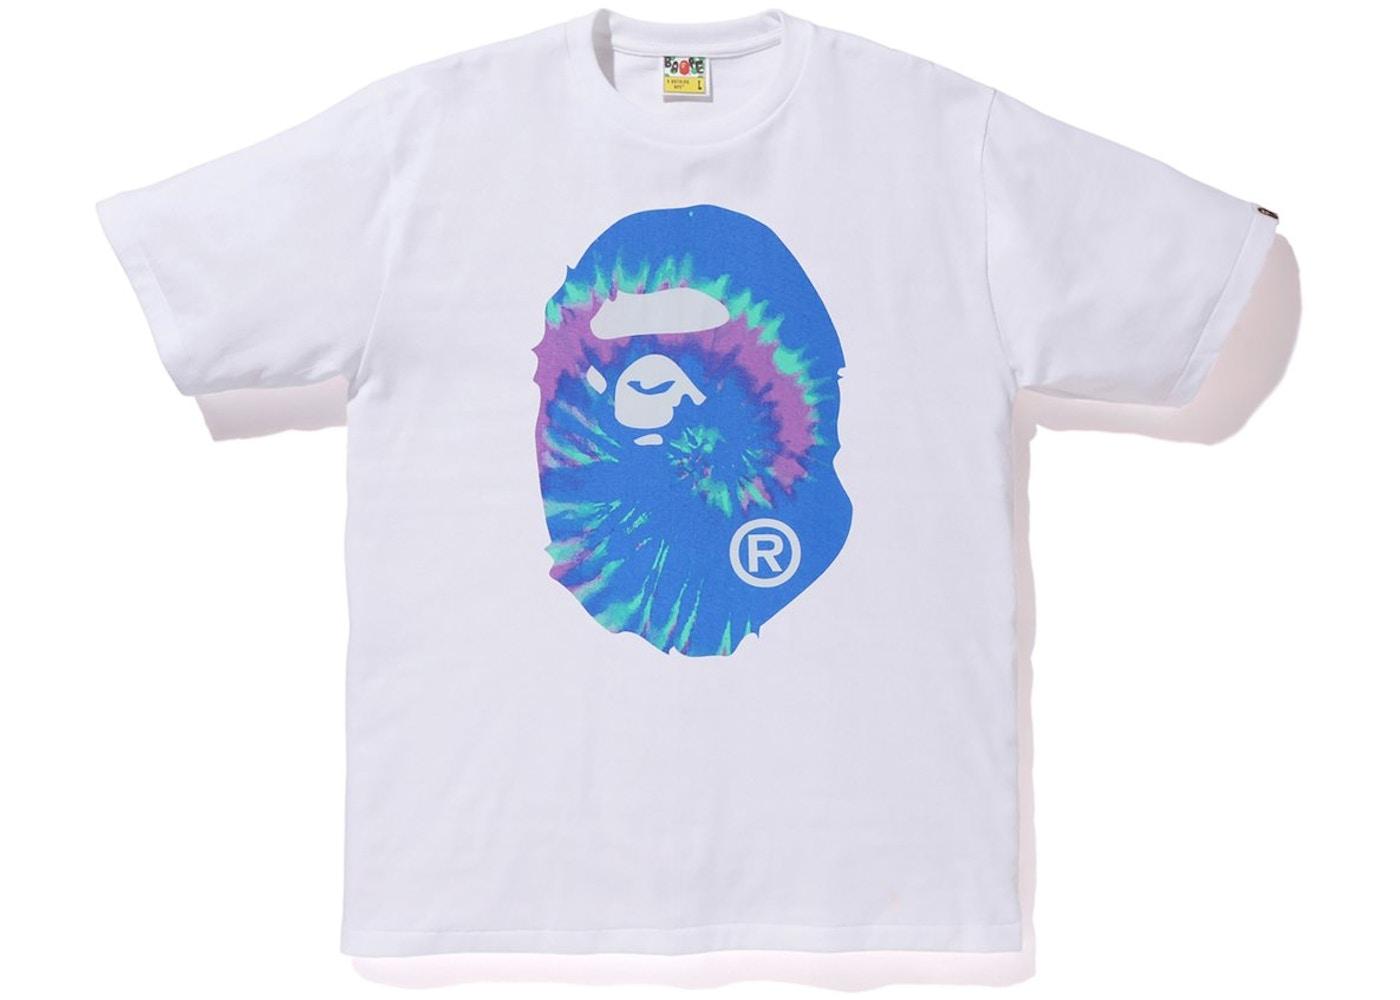 Bape Pigment Tie Dye Big Ape Head Tee White/Blue by Stock X